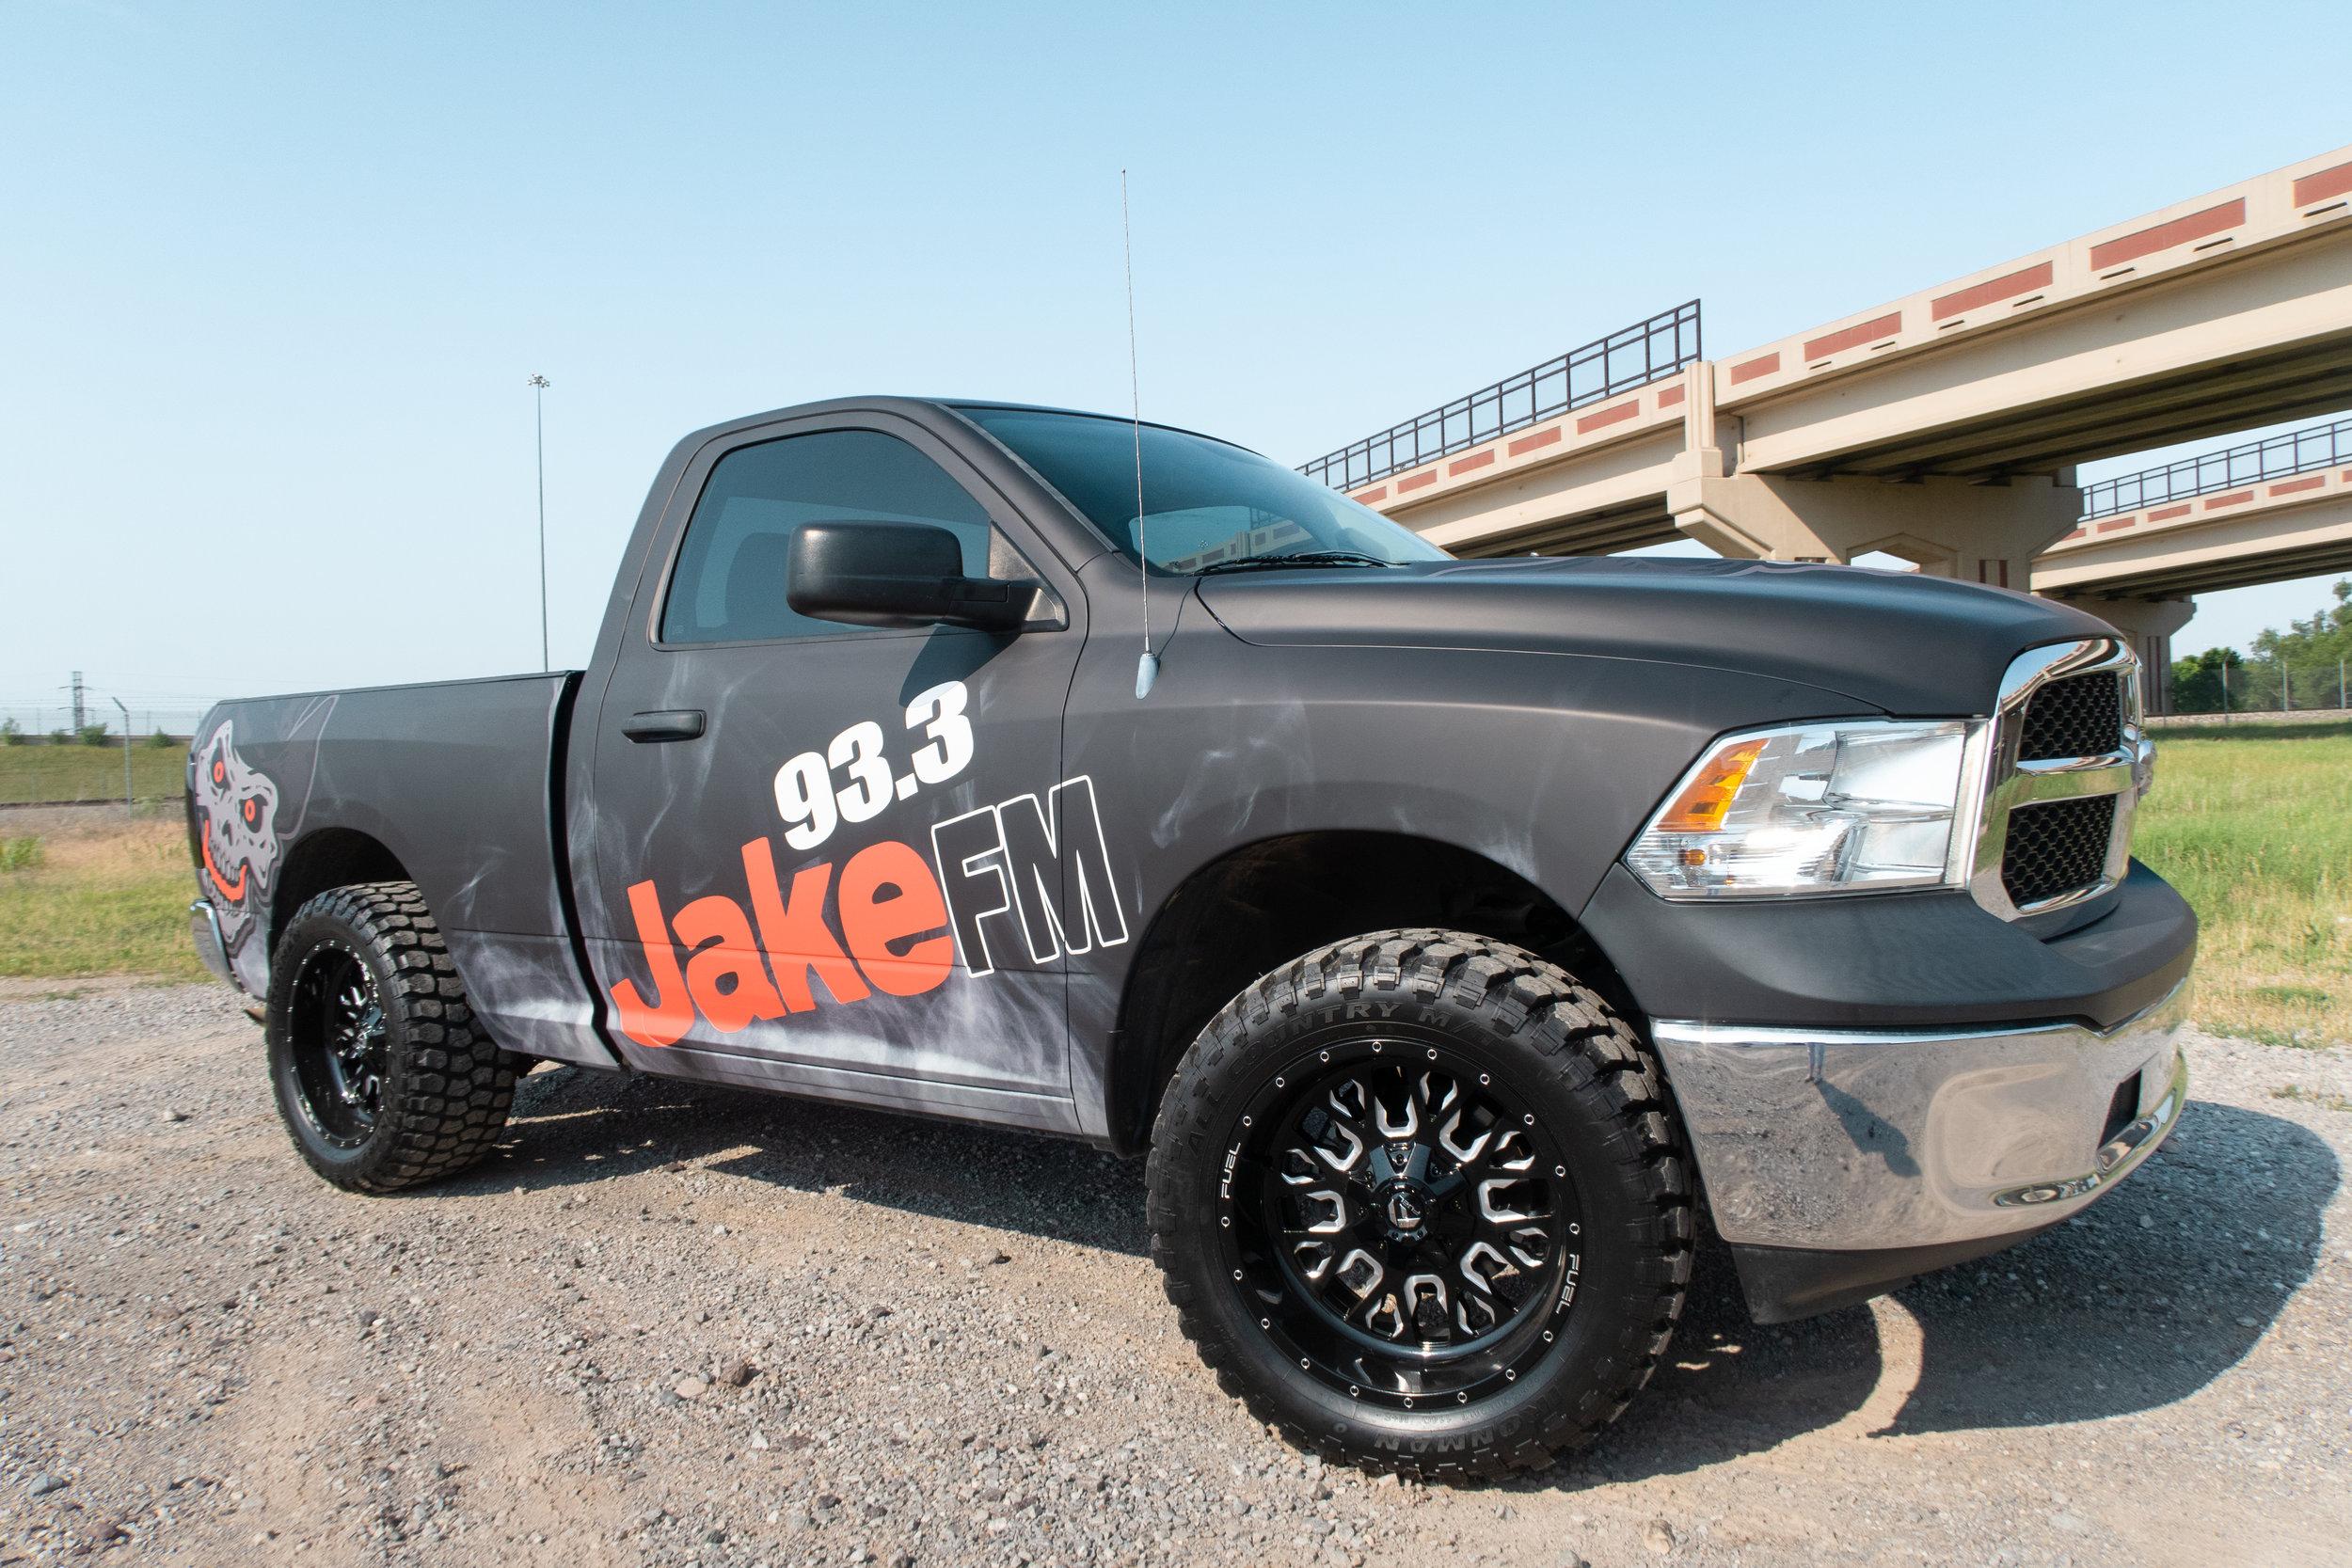 Jake FM 93.3 commercial wrap.jpg